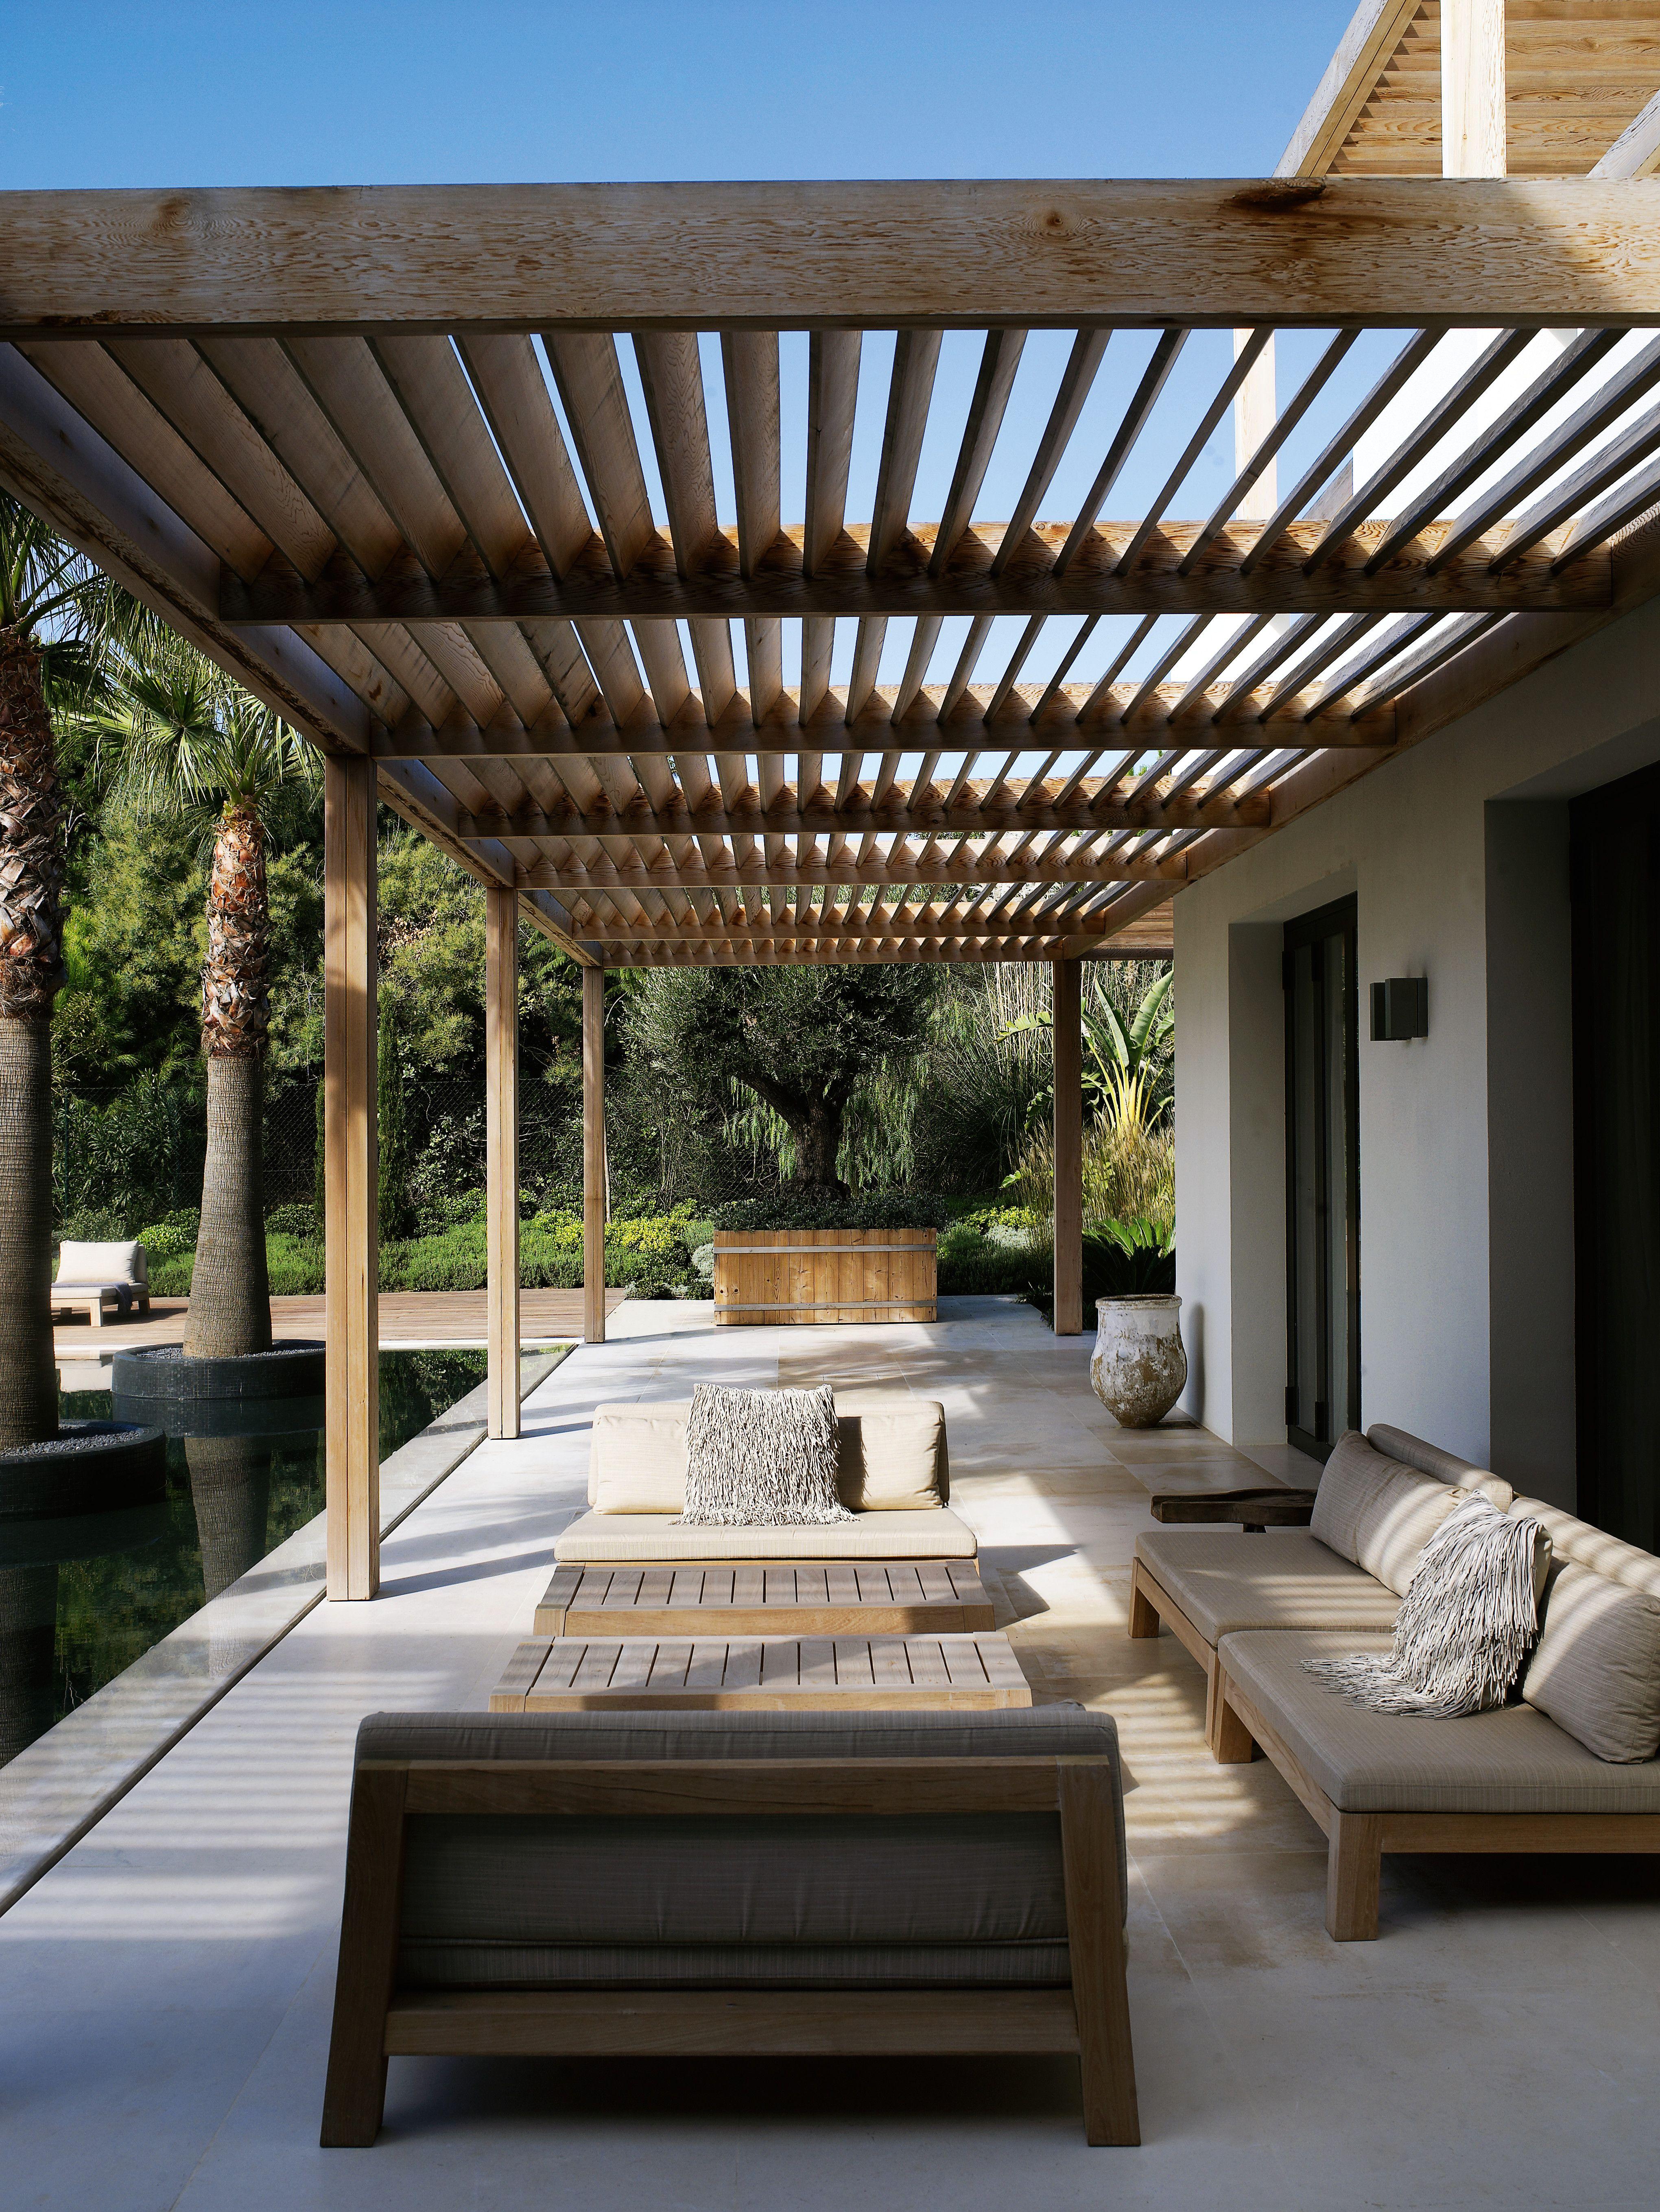 modern pergola going to make this when we renovate - modern terras - hout UURMETM